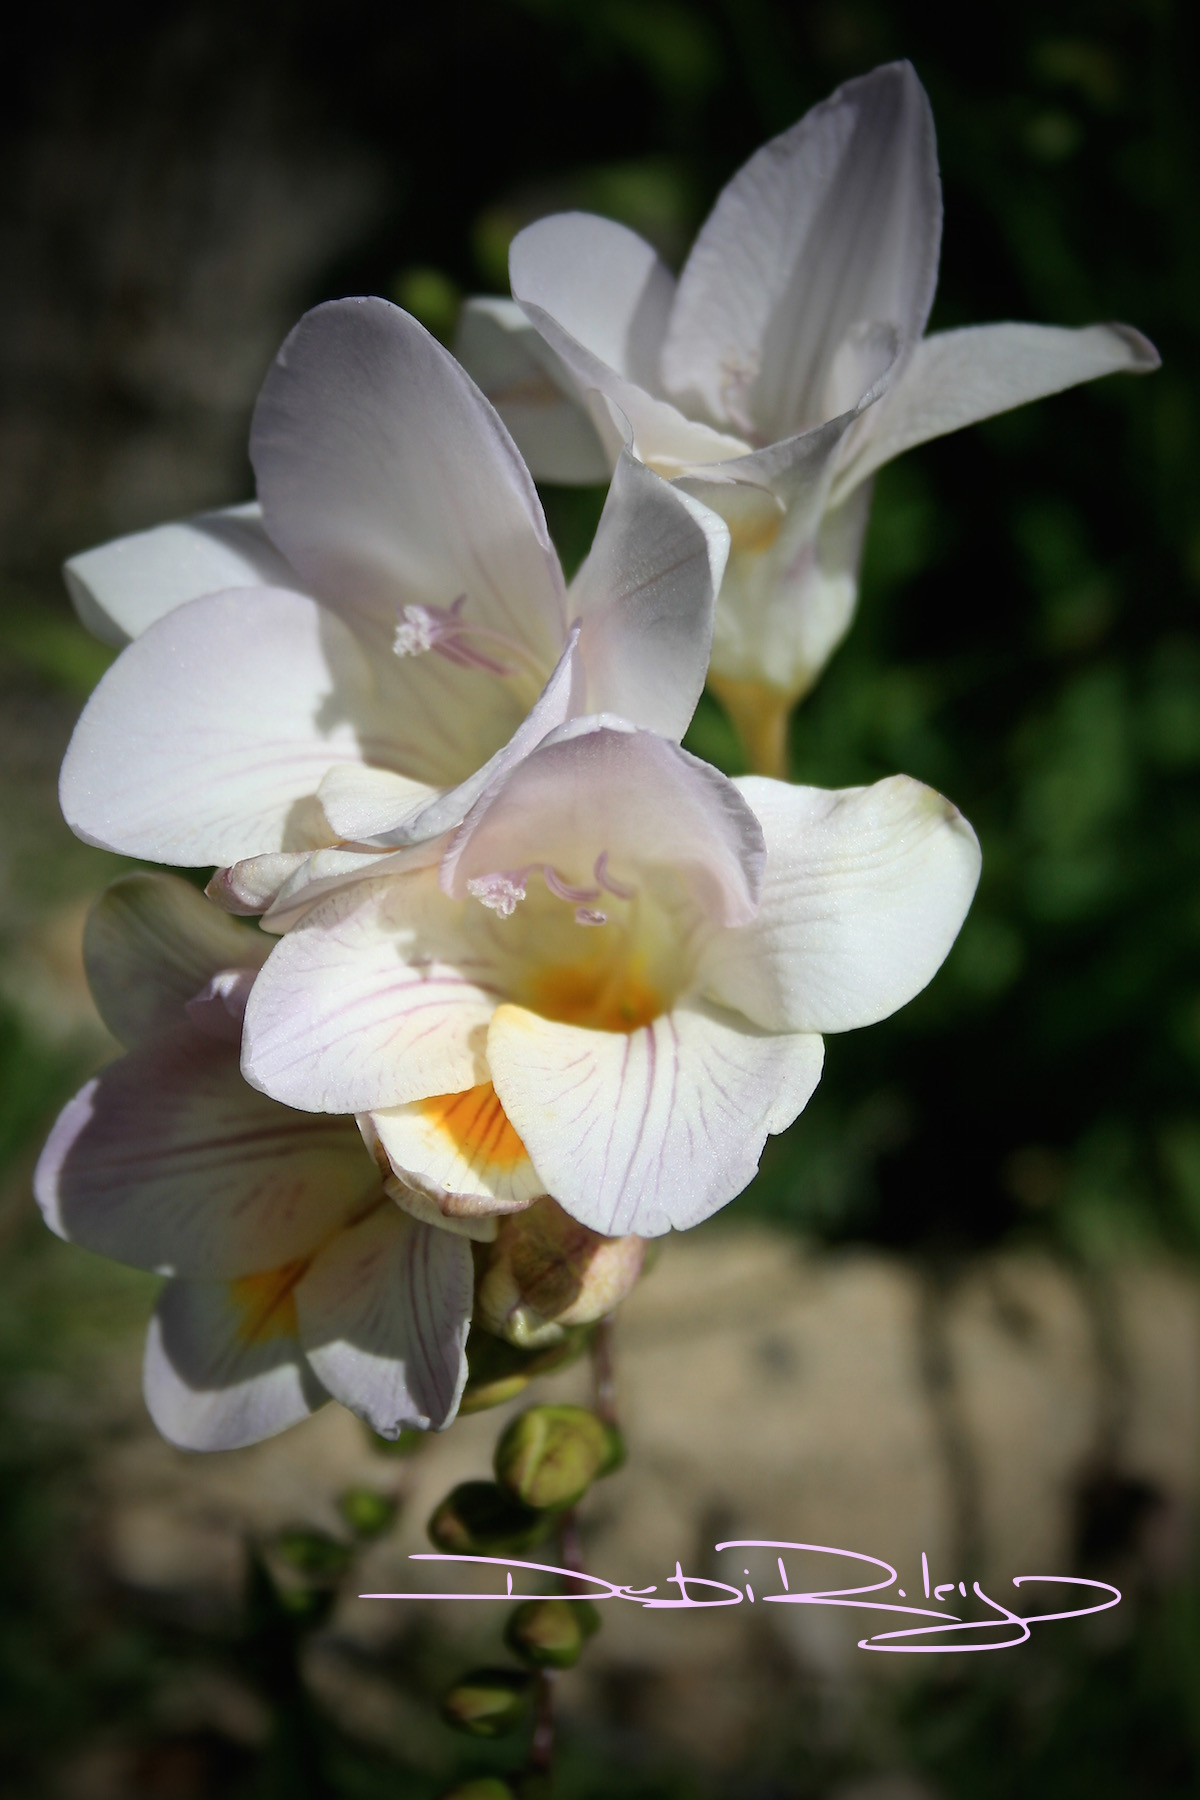 freesia in the gardens, debi riley photograph, flower gardens